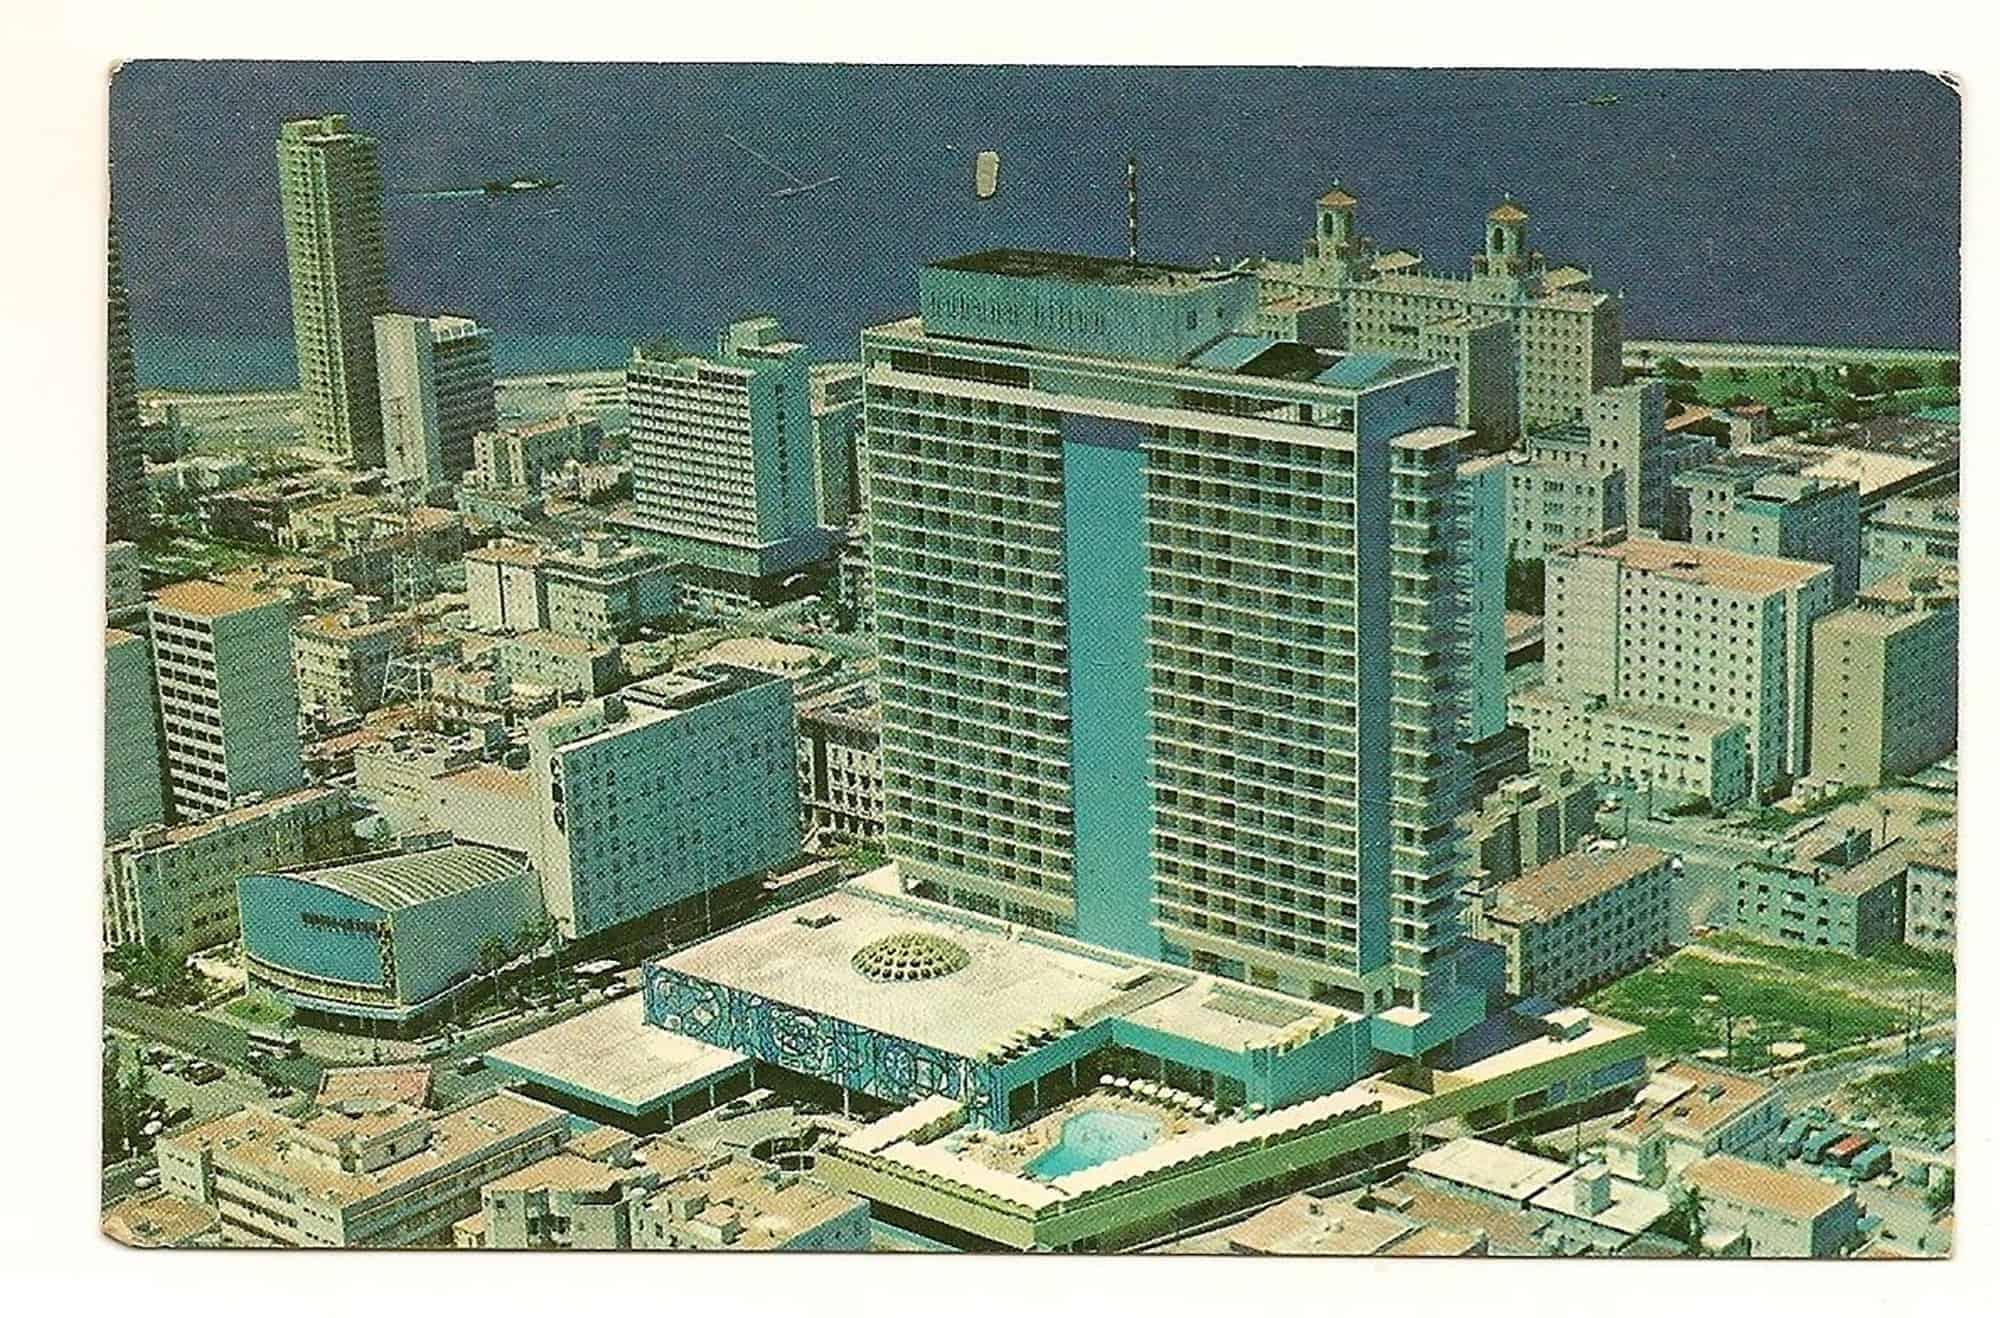 Havana Hilton, 1959